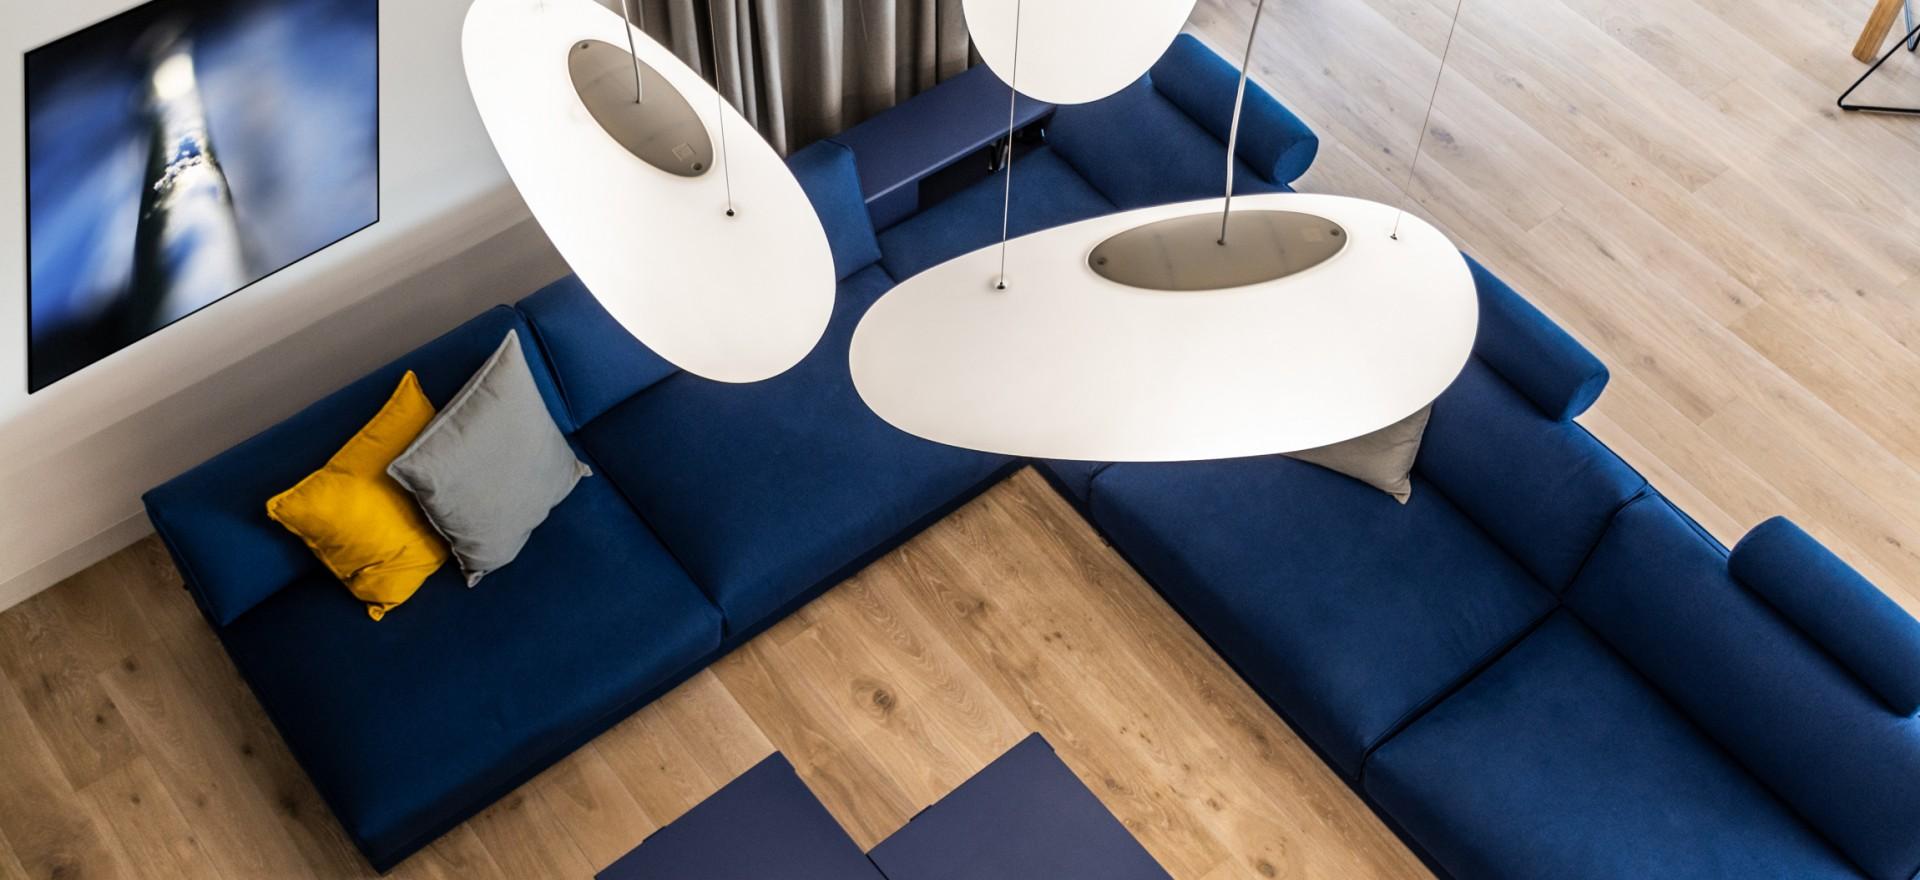 1_Dom-pod-miastem_Artes-Design-i-SZARA-studio